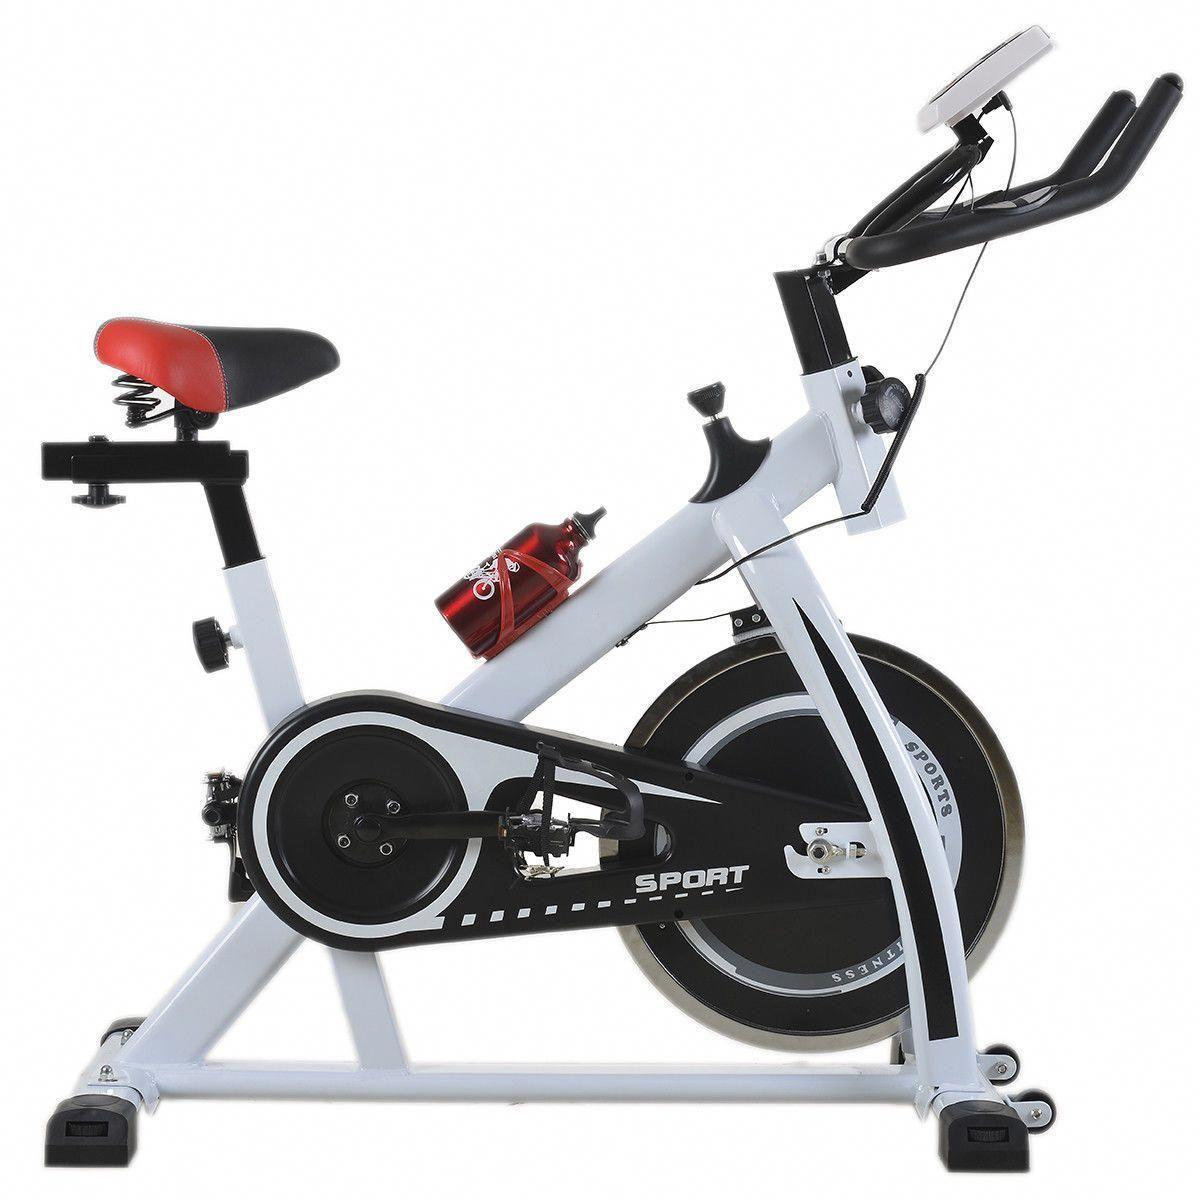 White Cycling Trainer Fitness Exercise Bike Stationary Cardio Home Indoor 508 Roadbikewomen Roadbikeforbeginne Indoor Bike Workouts Biking Workout Indoor Bike